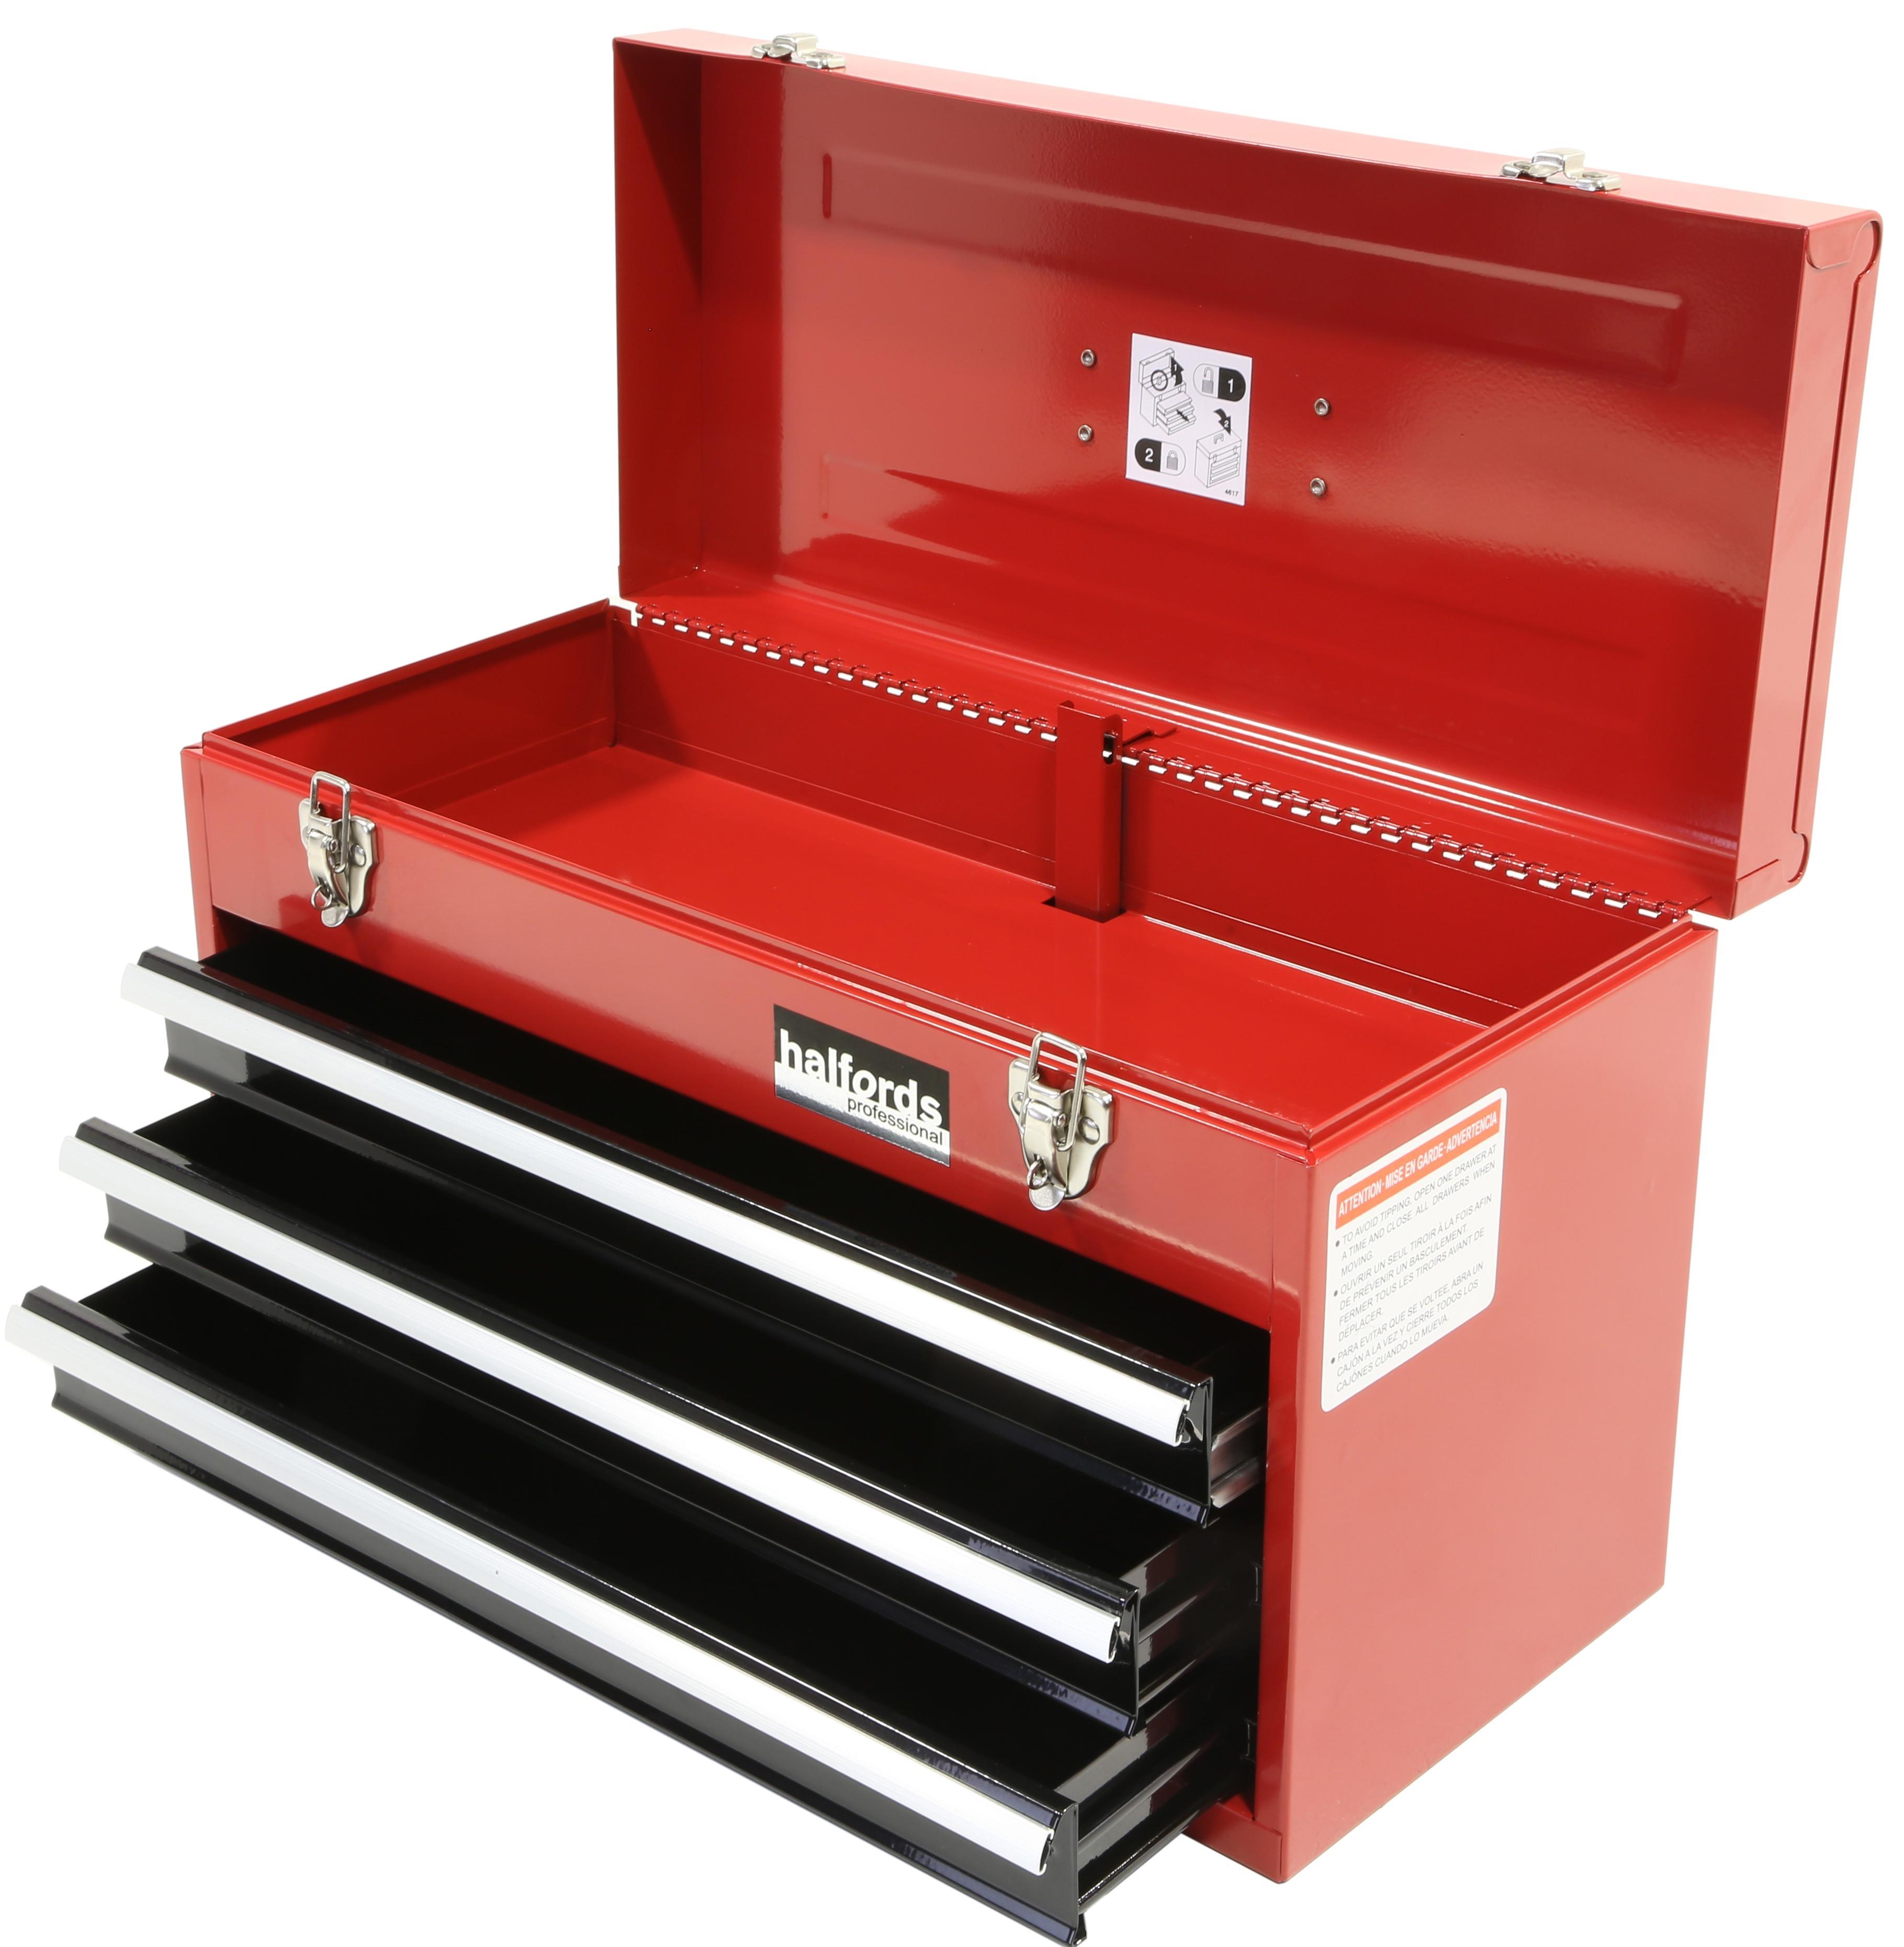 halfords professional tool chest red 3 drawer metal. Black Bedroom Furniture Sets. Home Design Ideas